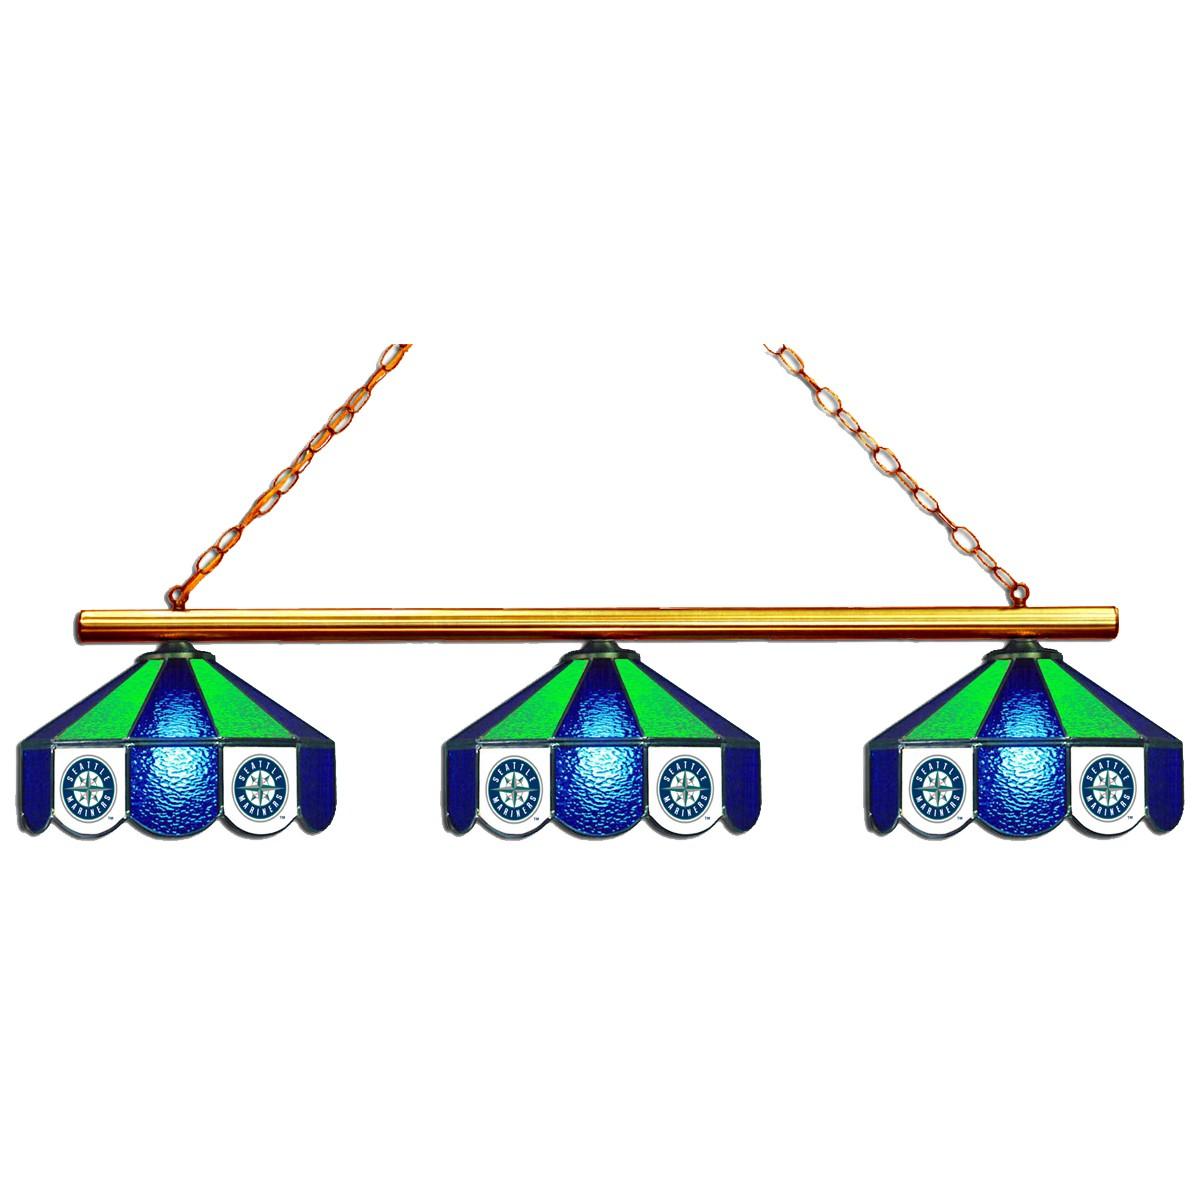 SEATTLE MARINERS 3 SHADE GLASS LAMP